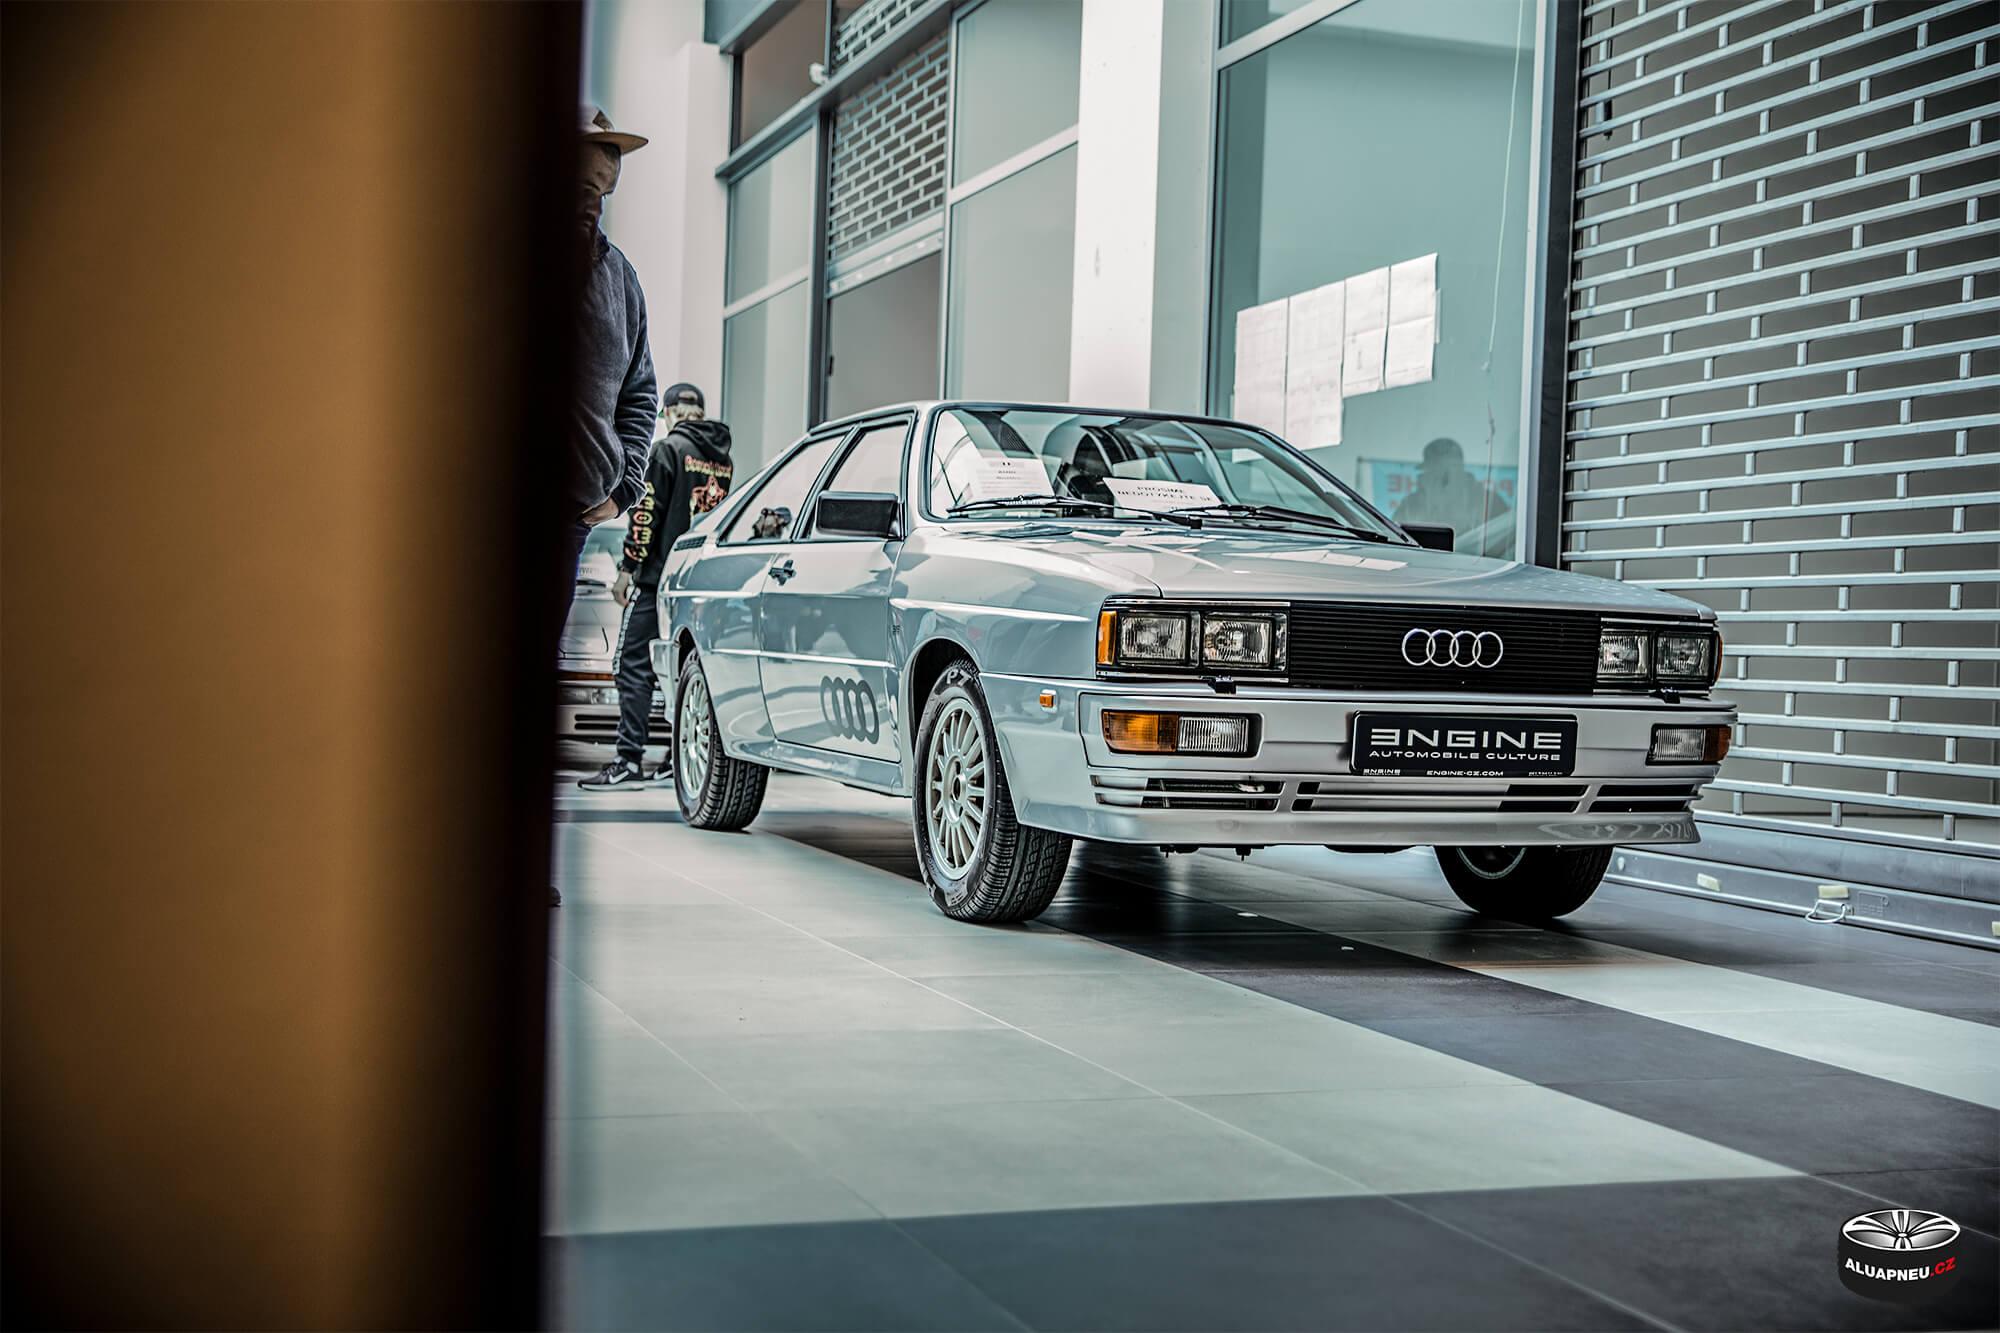 Audi Coupe - original alu kola - Youngtimer - www.aluapneu.cz